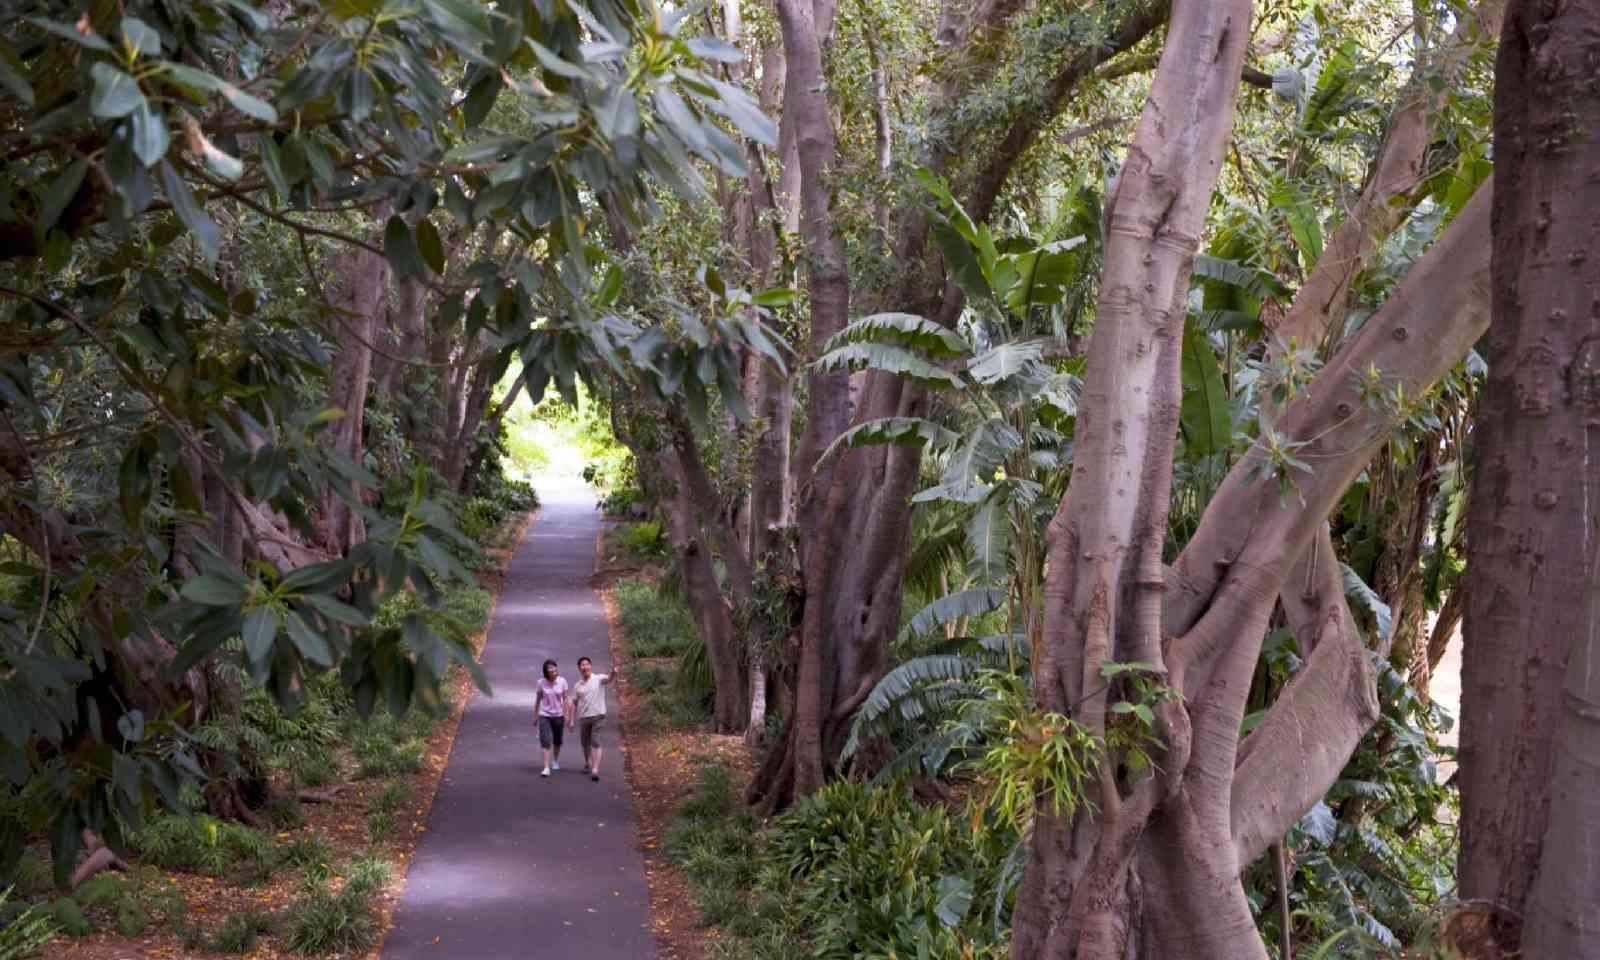 Adelaide Botanic Garden (SATC)